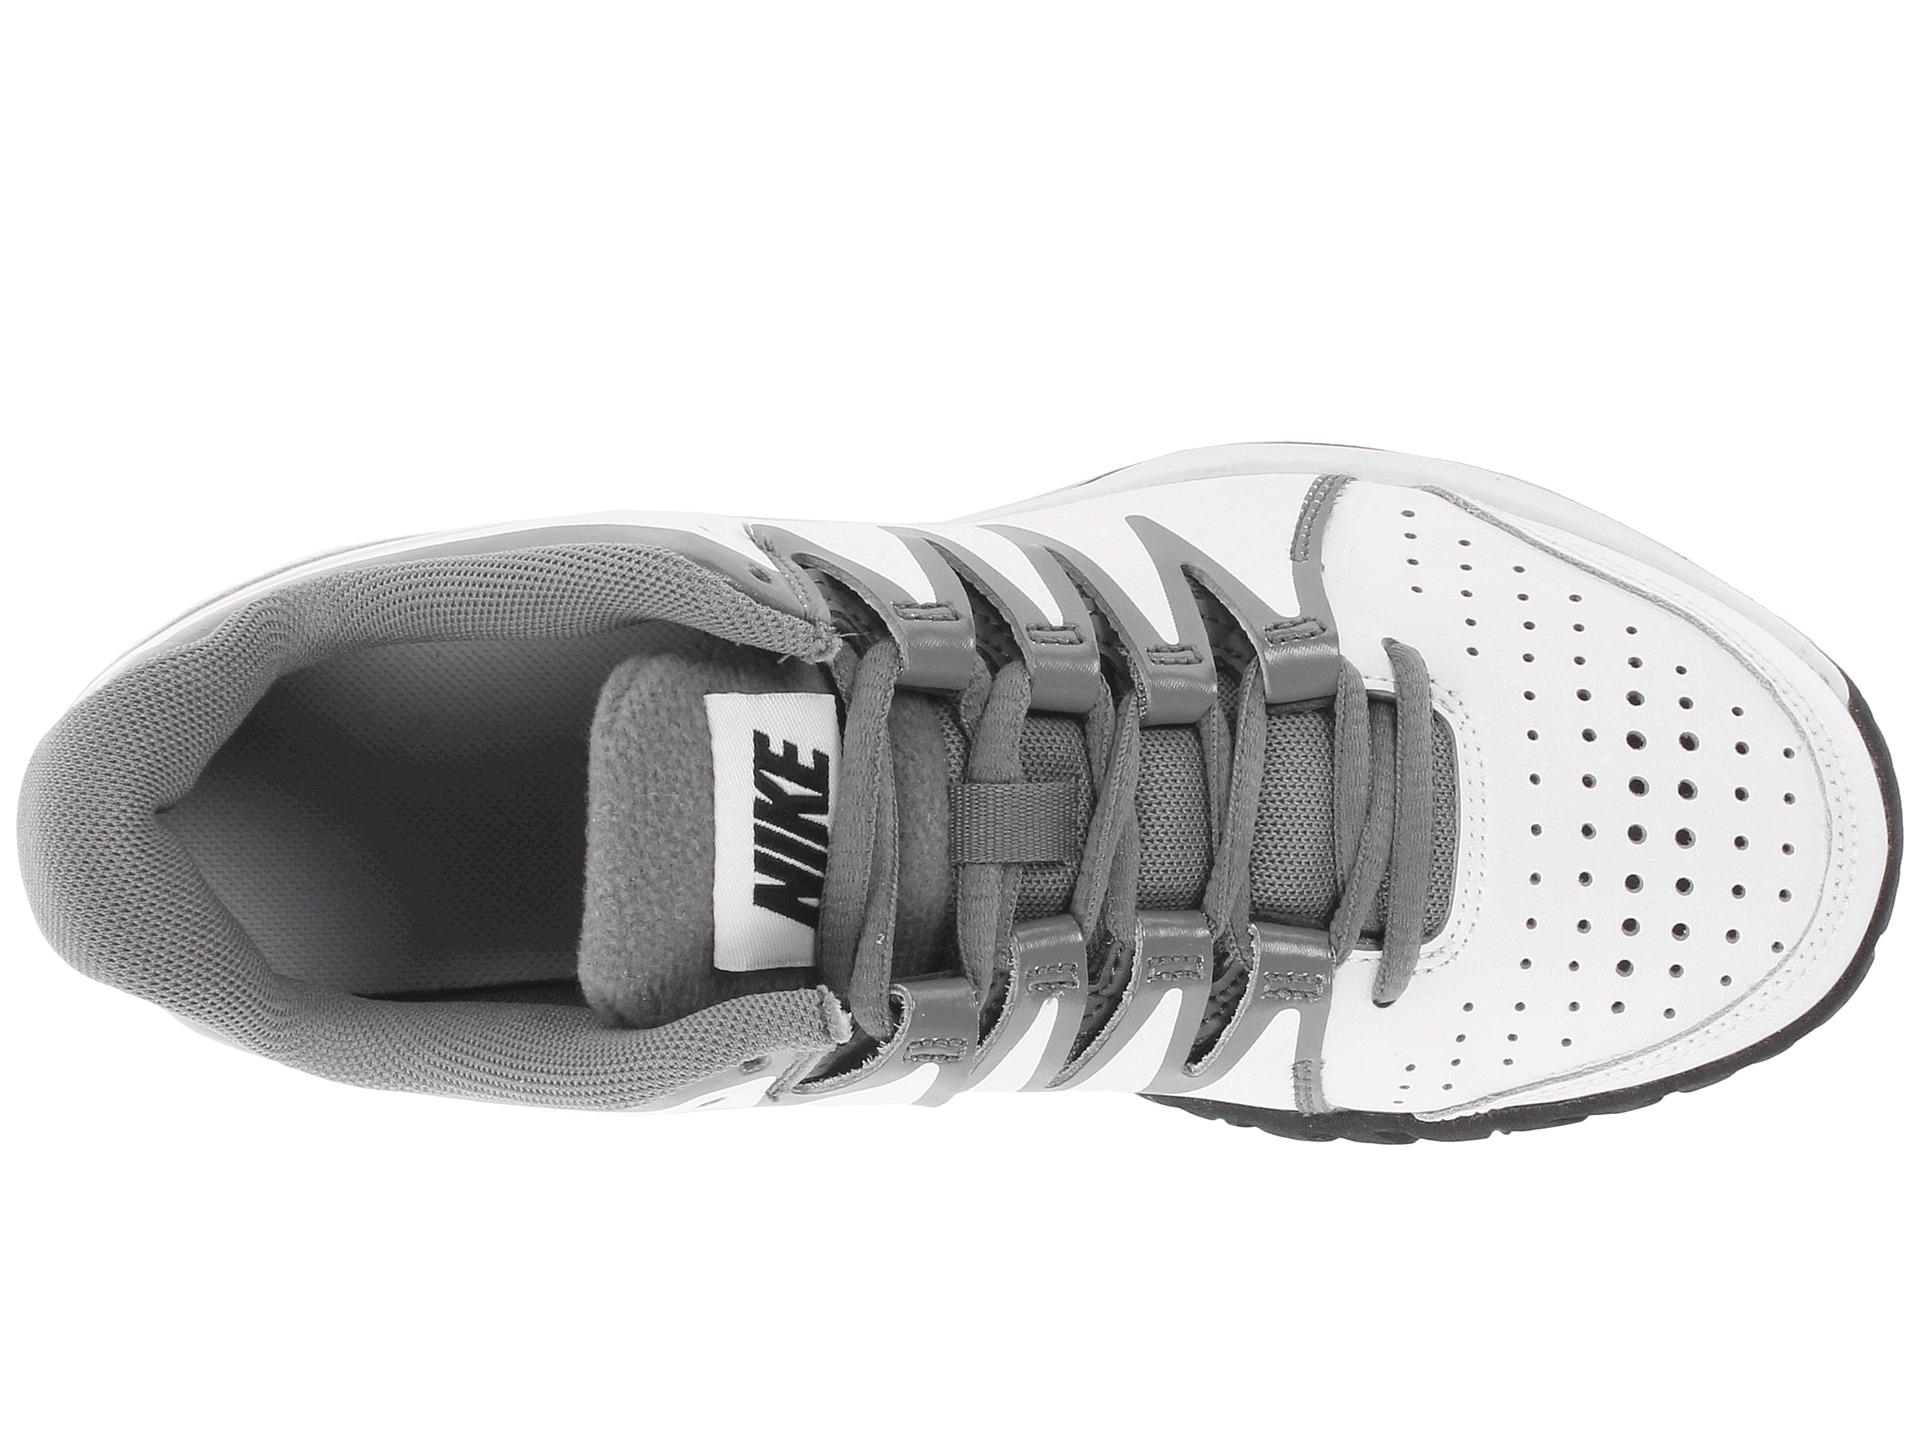 nike vapor court tennis shoes women | David Goodenough